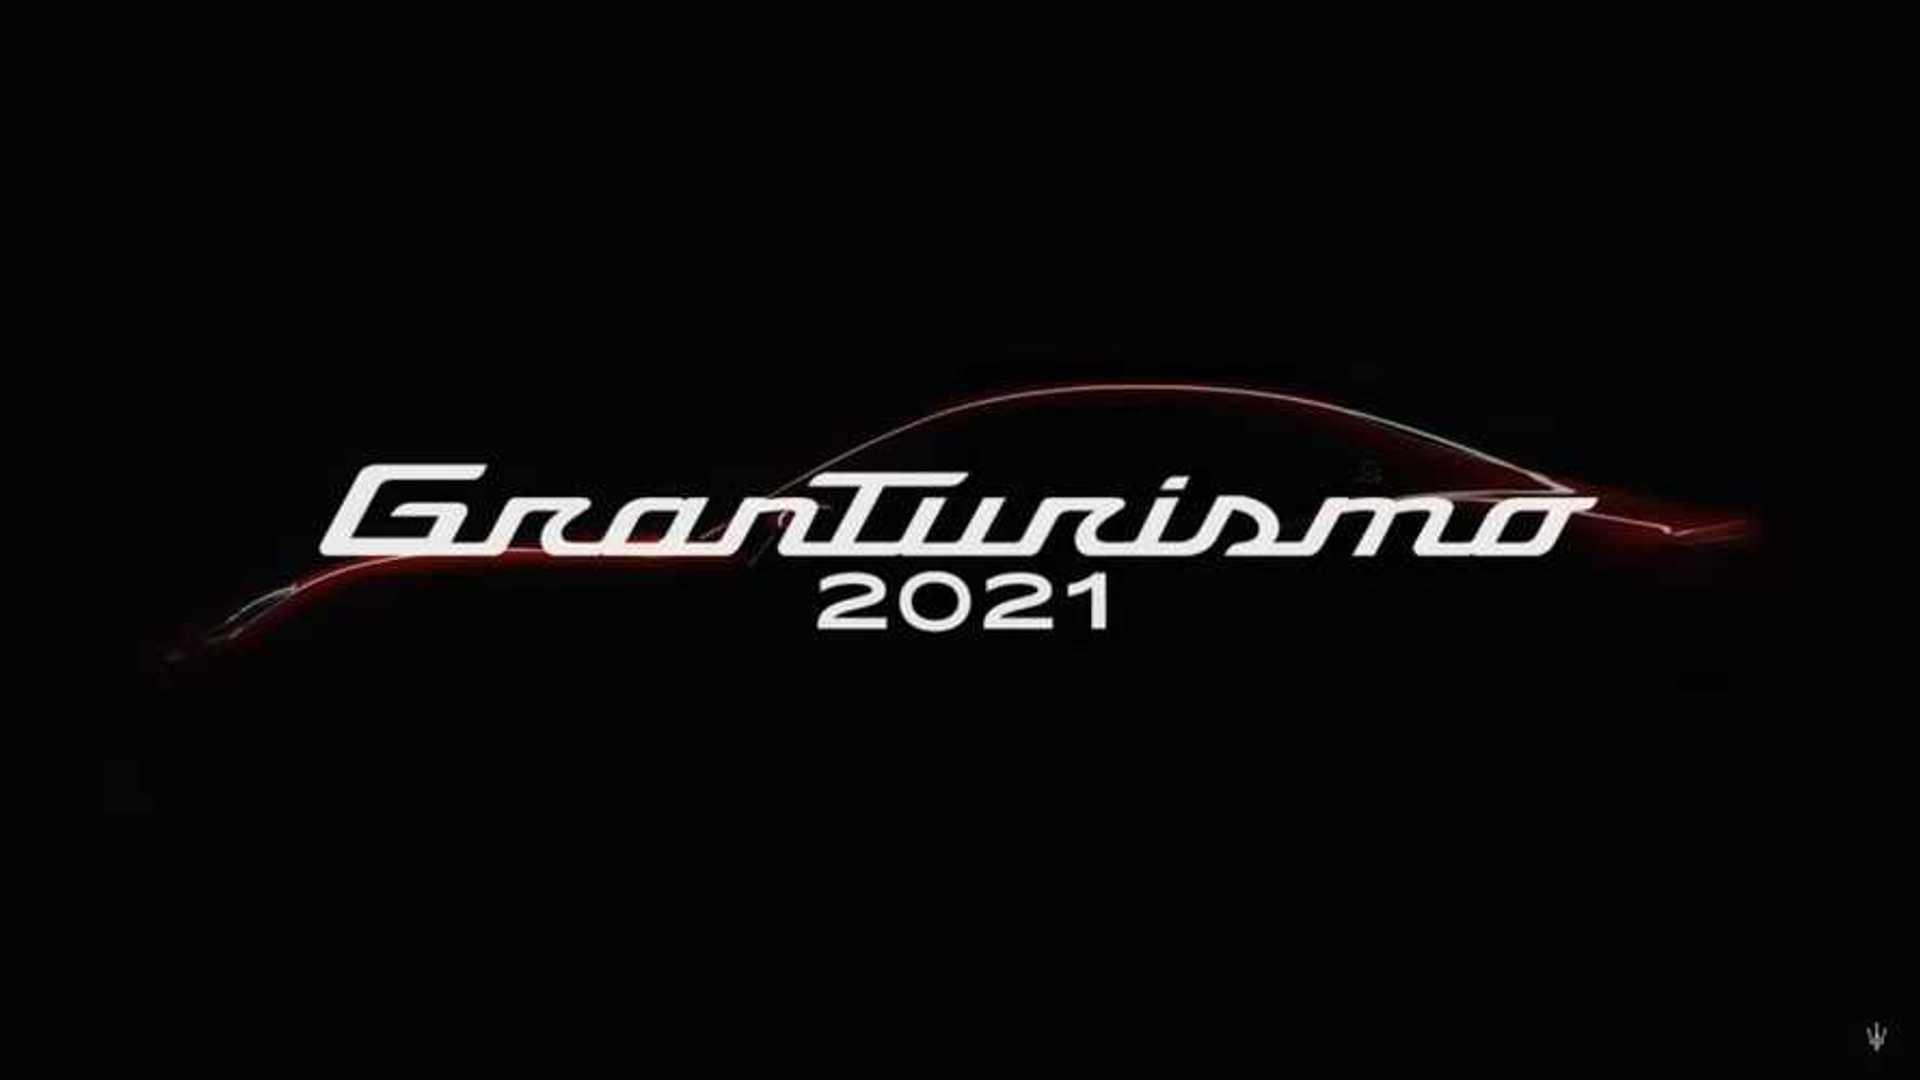 2021 GranTurismo Teaser Photo